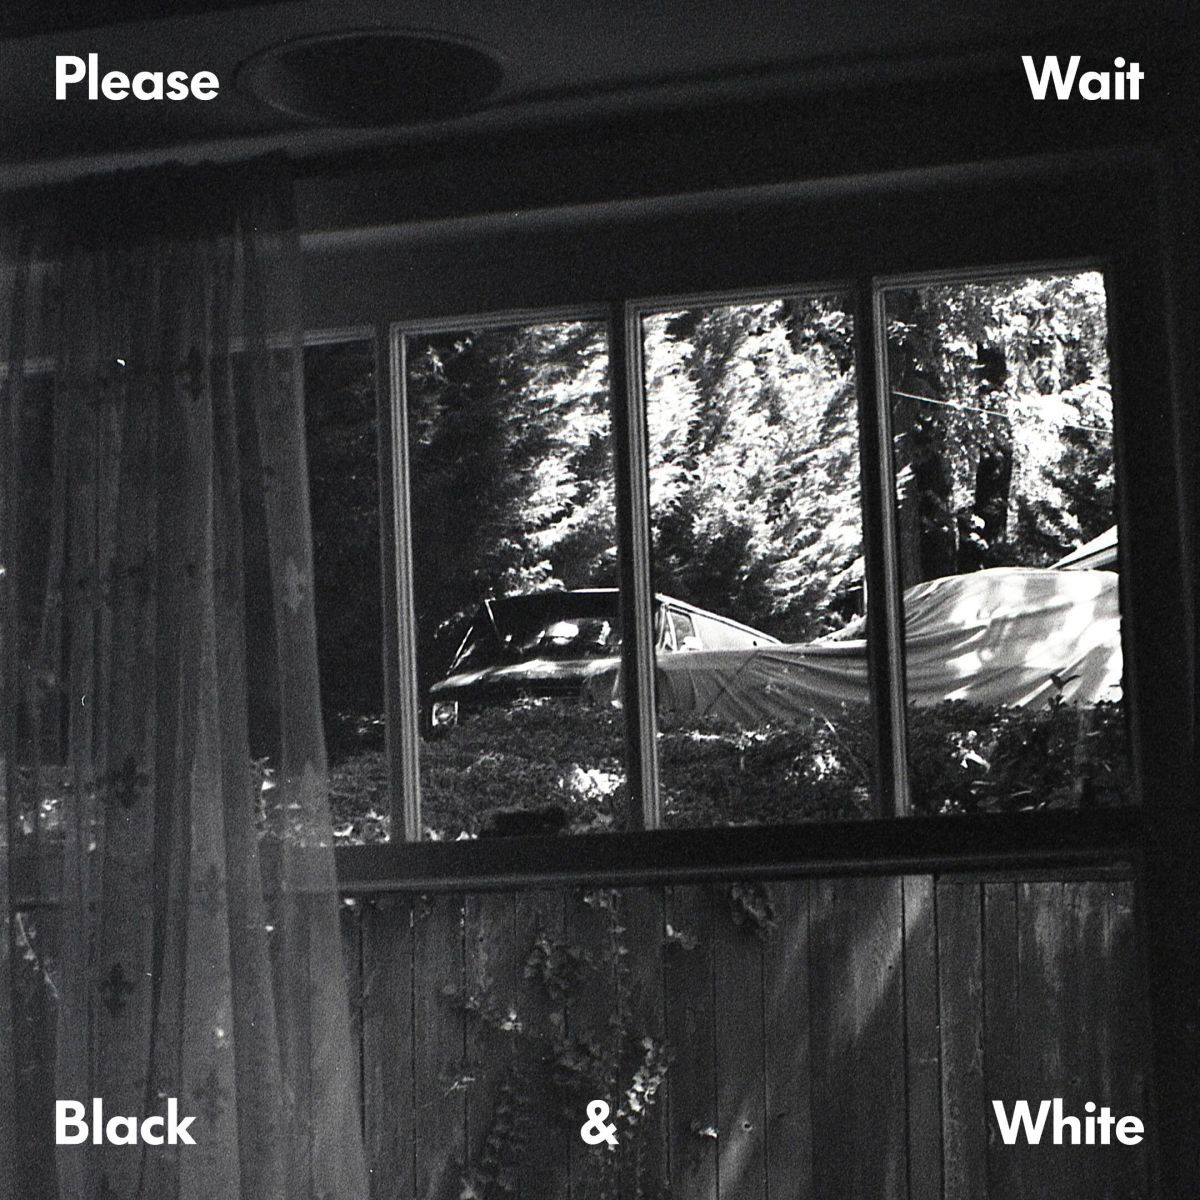 Please Wait Ta-ku matt mcwaters Black & White